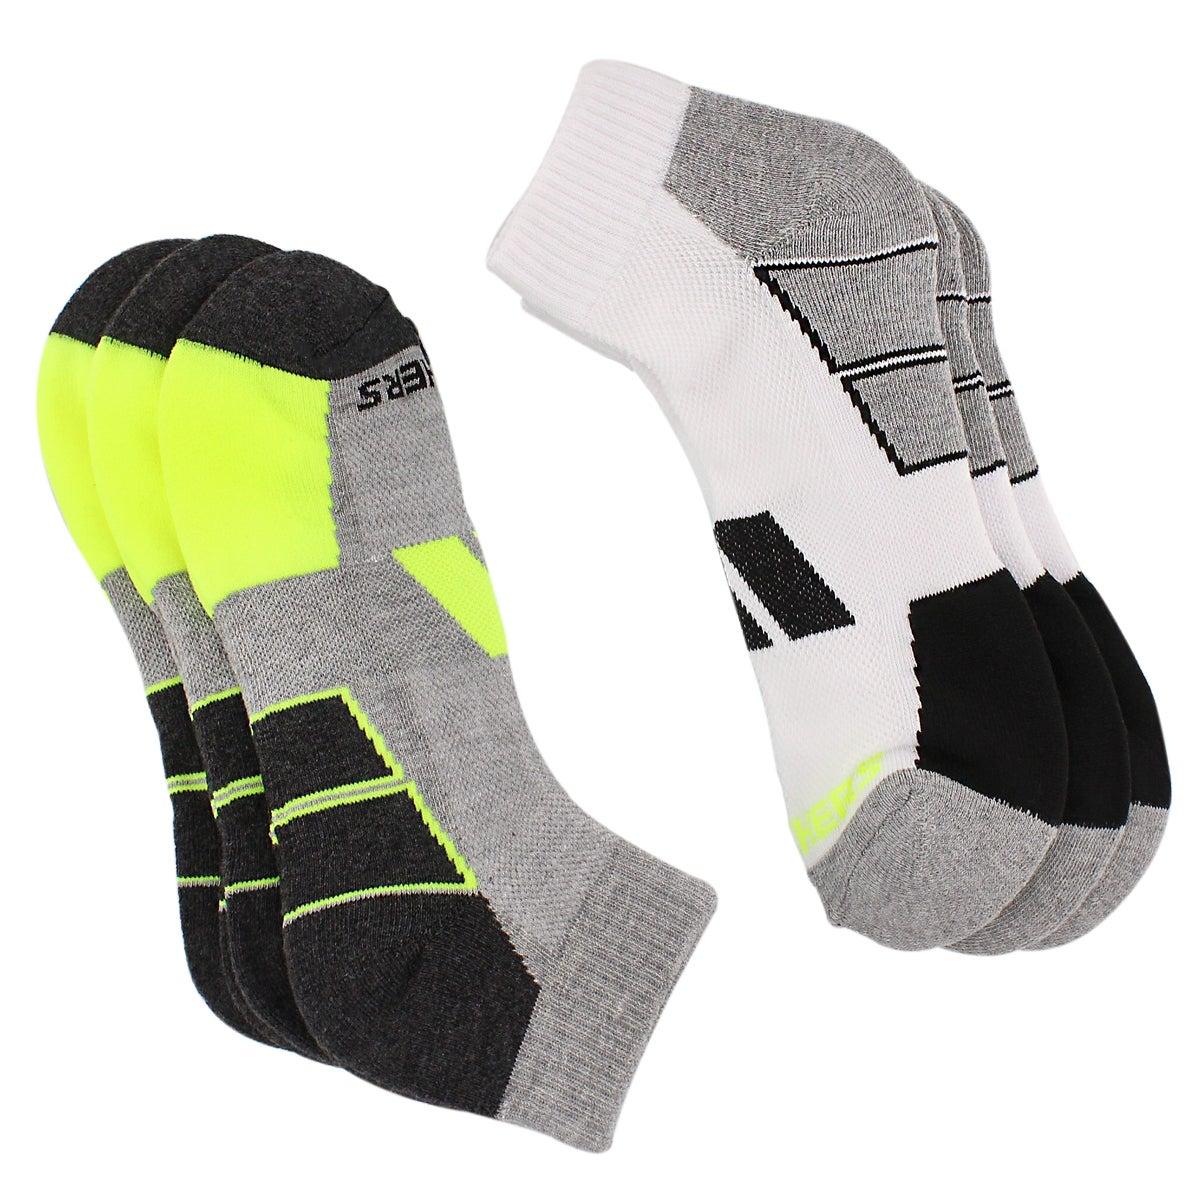 Mns 1/2 Terry Qtr Crew blk/yel 6pk sock